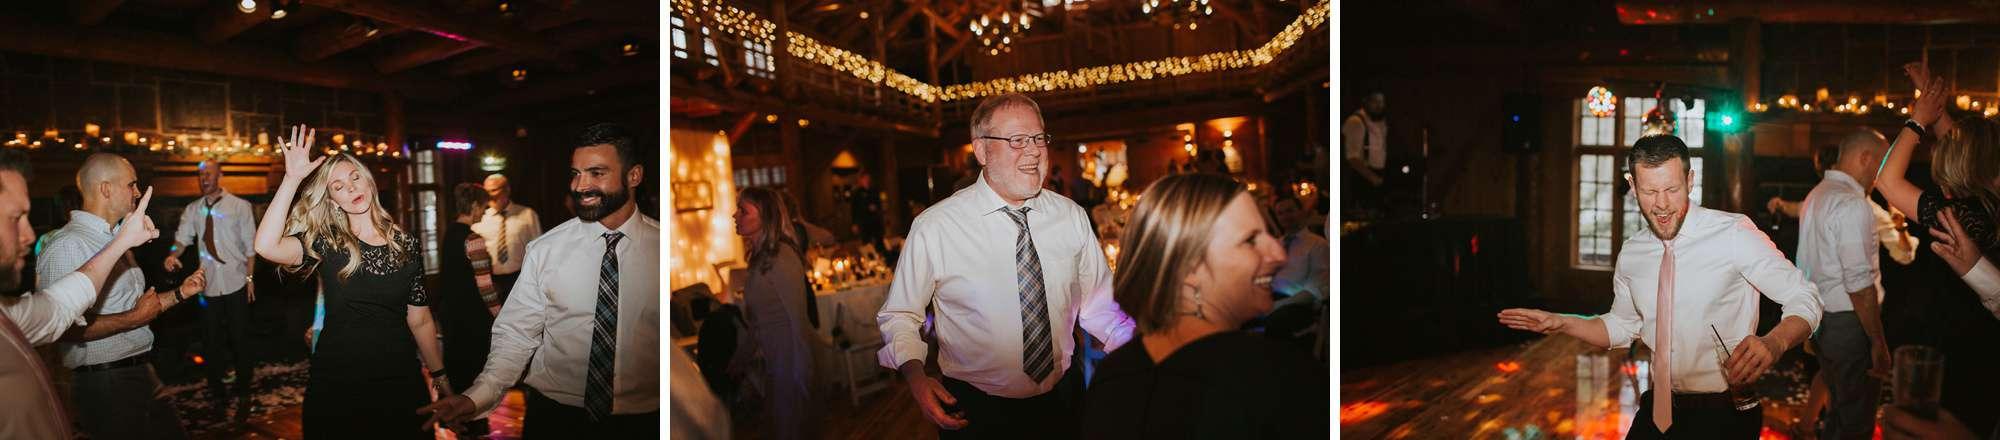 Sara Emily Sunriver Bend Oregon Rustic Lodge Wedding 0081